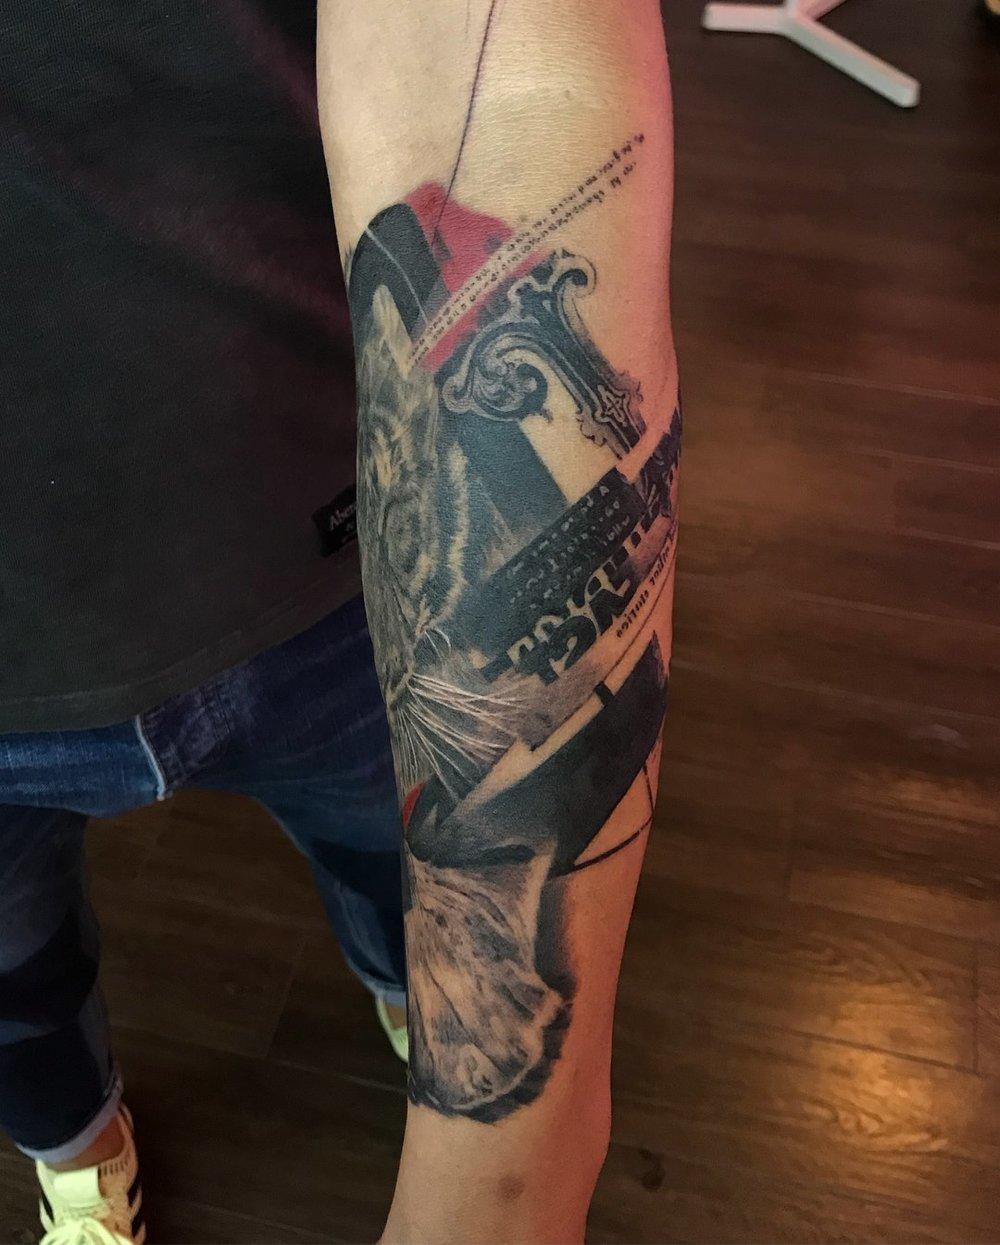 2018-fridays-tattoo-hong-kong-jamie-graphic-tiger-2.jpg